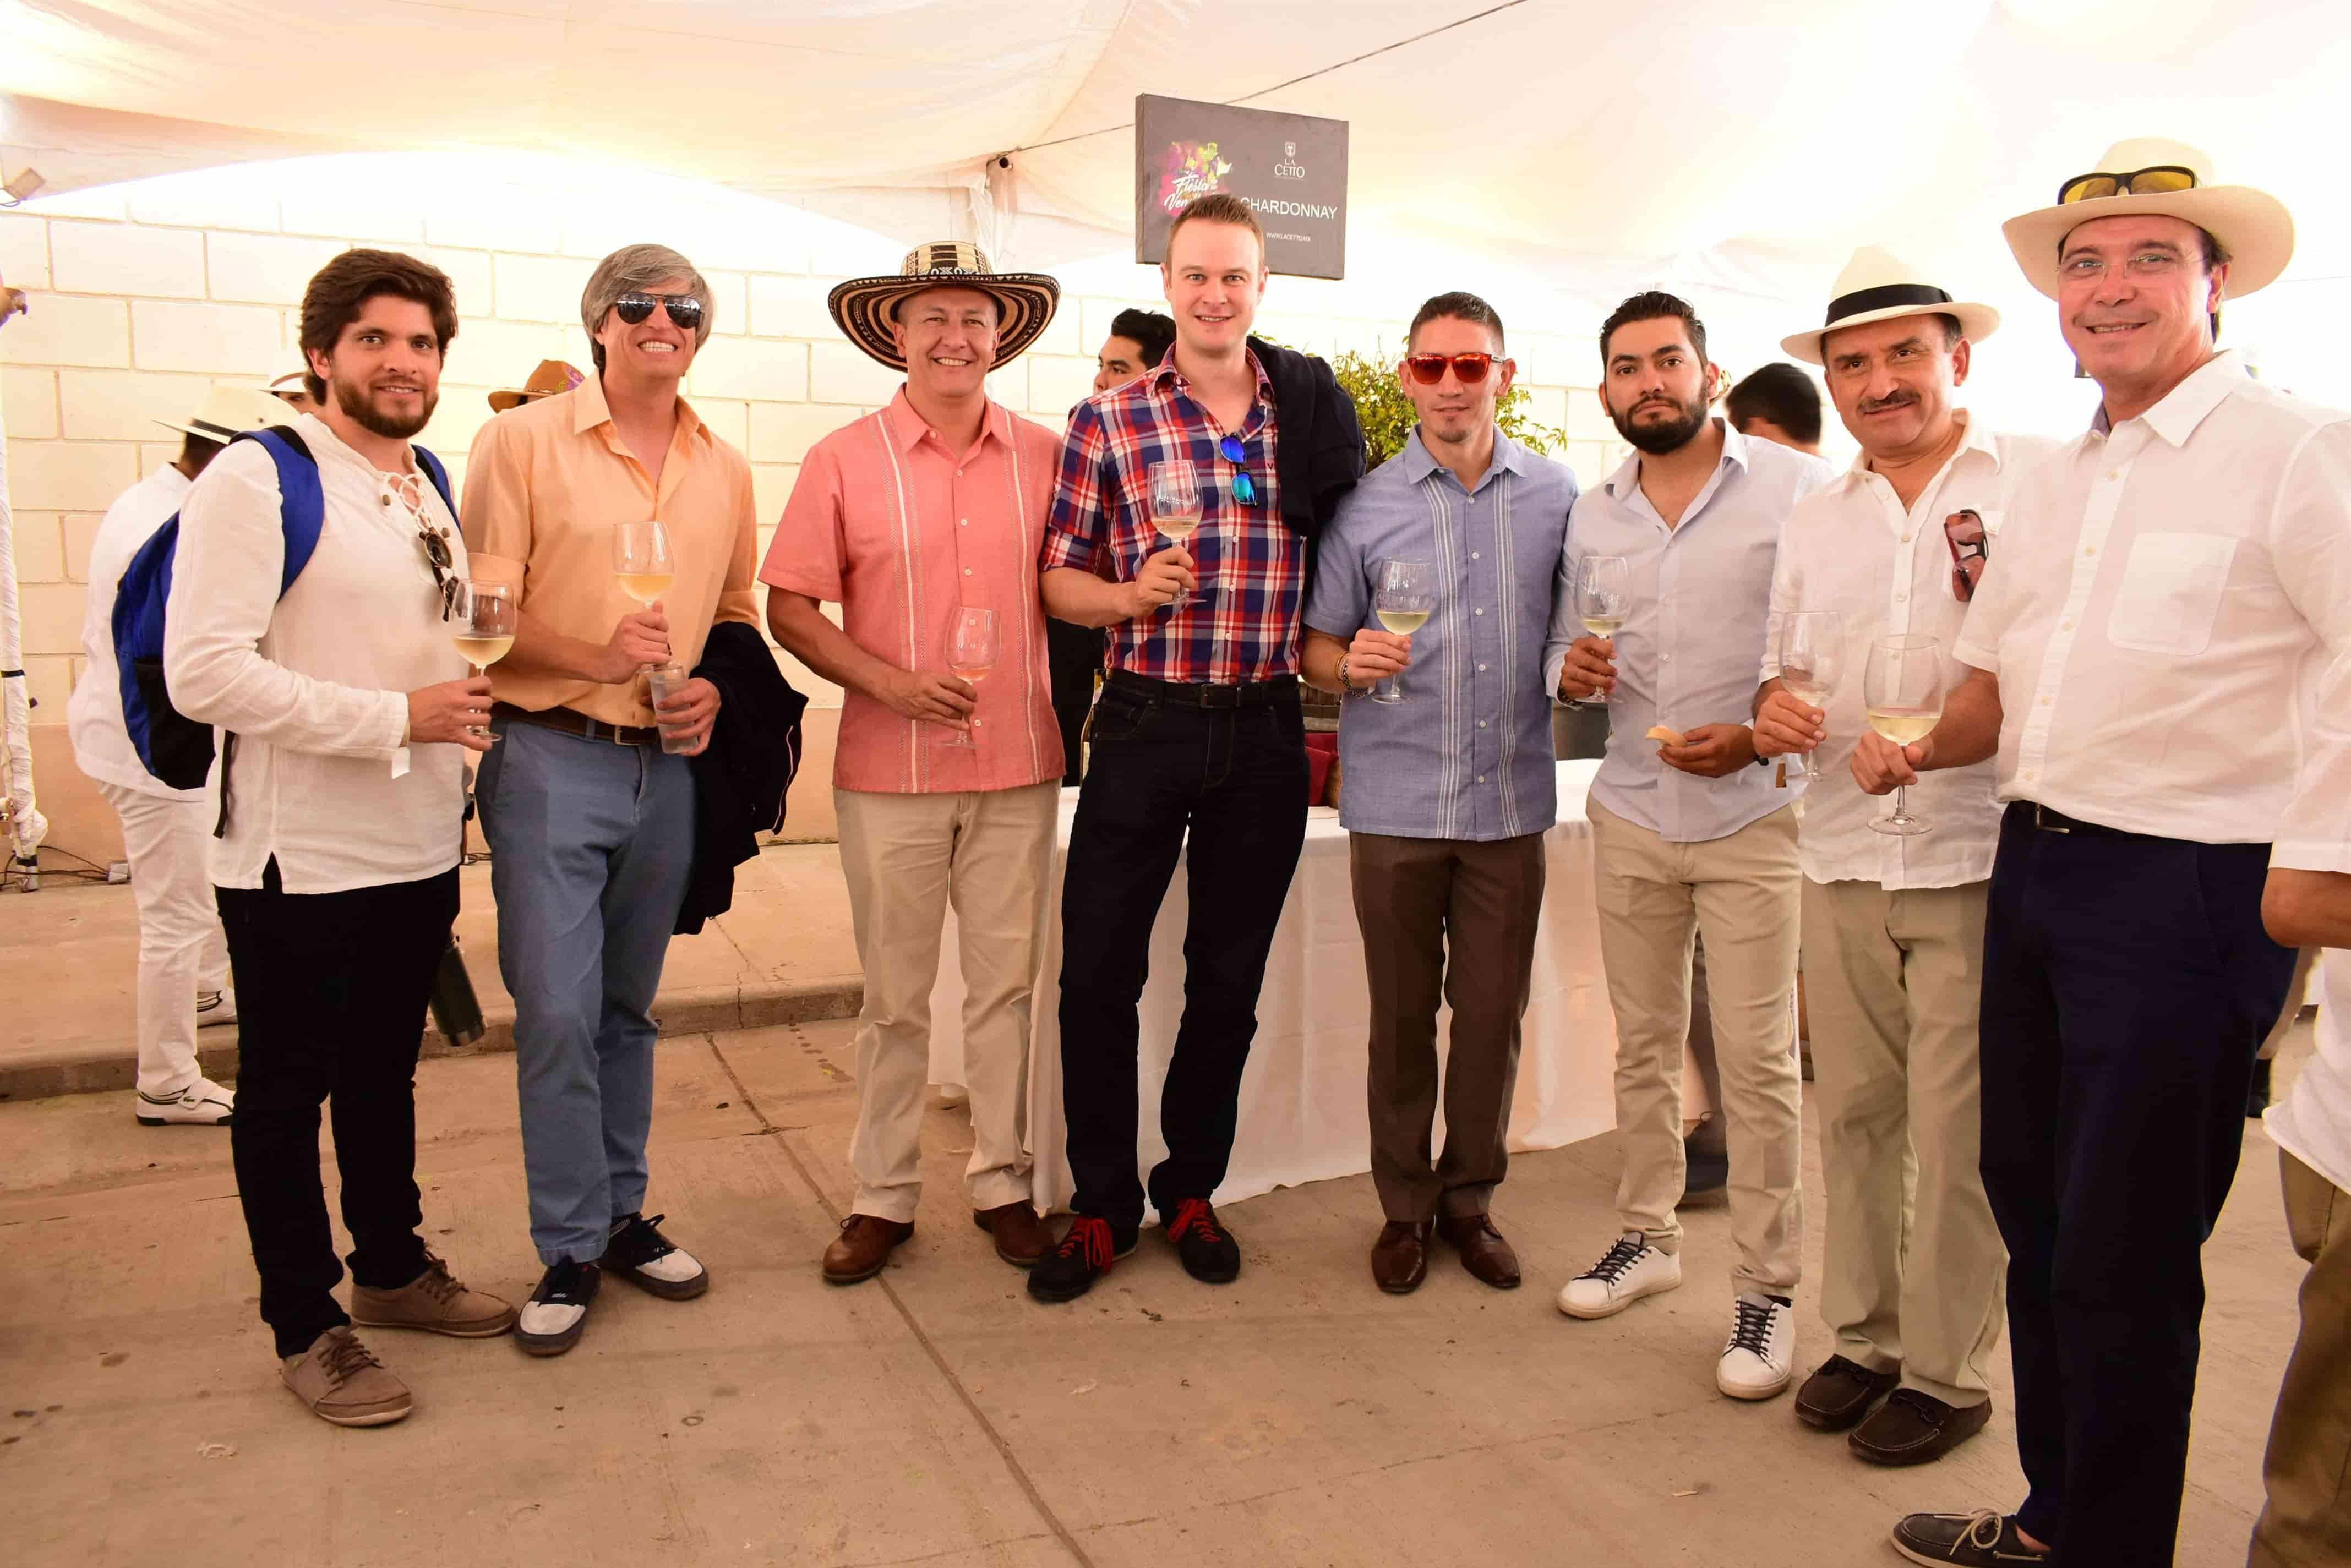 Fiesta de Vendimia LA CETTO 2019